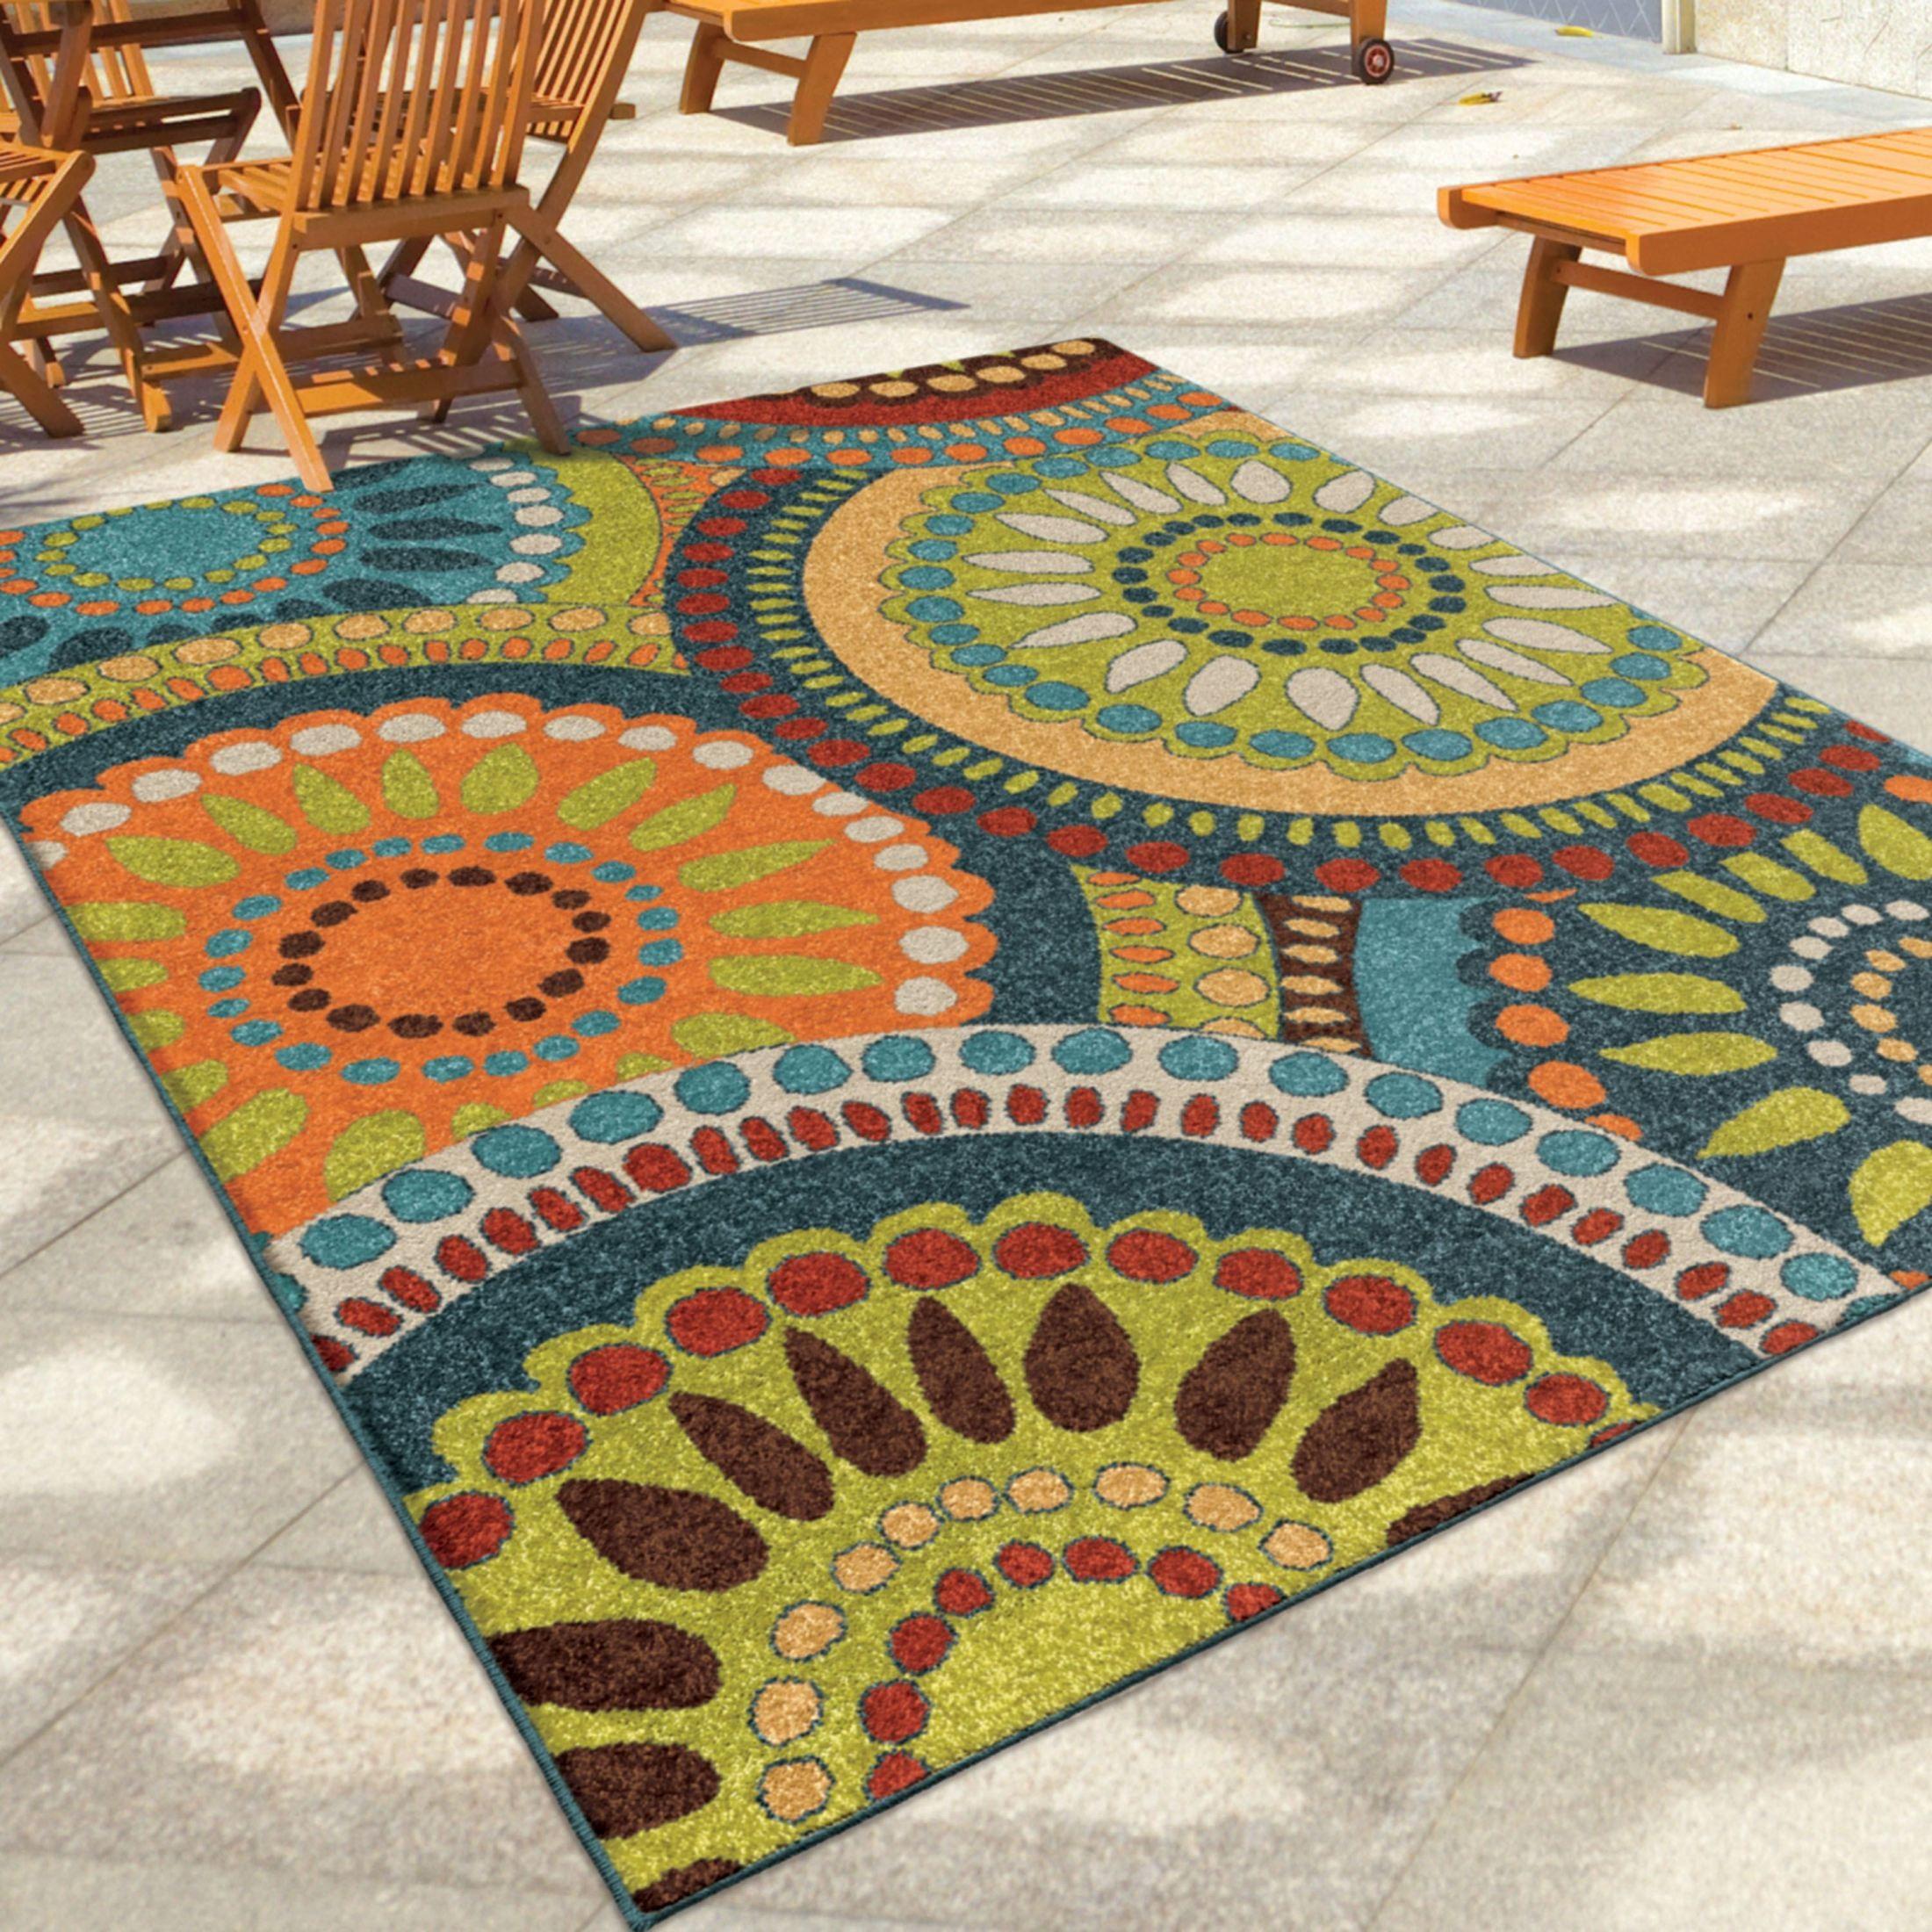 Rugs Furniture: Orian Rugs Indoor/Outdoor Circles Merrifield Collage Multi